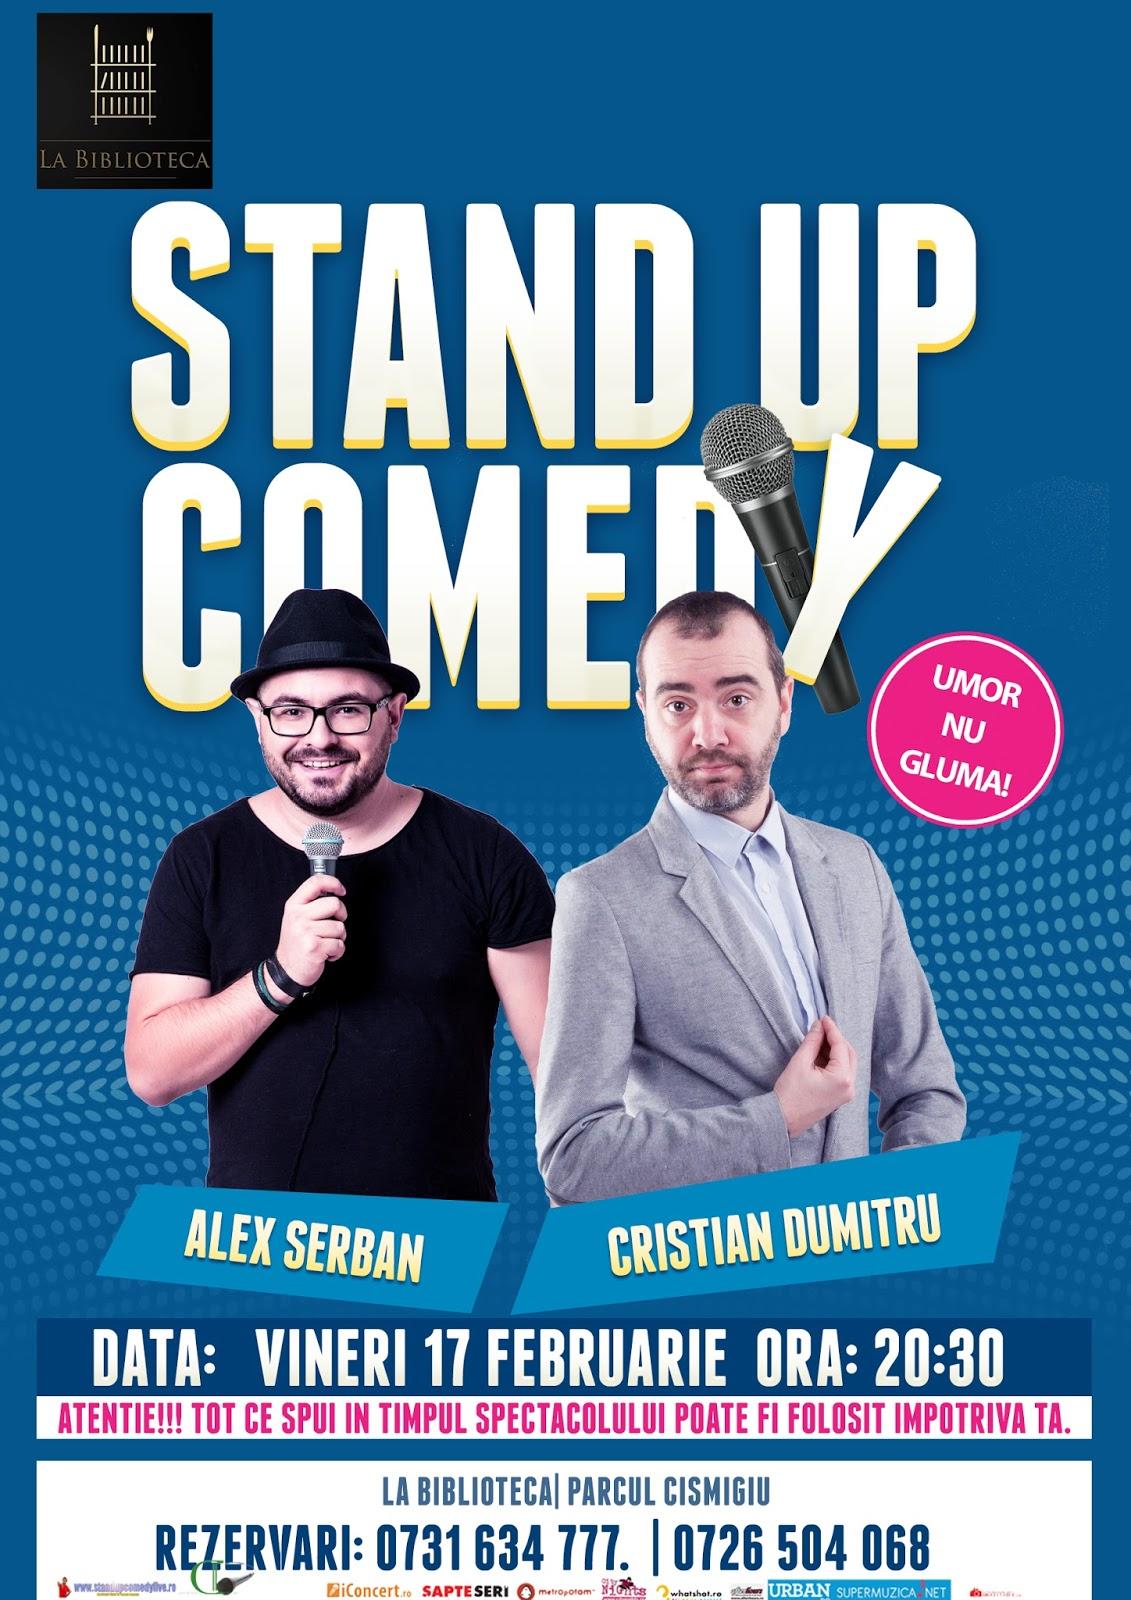 Stand-Up Comedy Vineri 17 Februarie Bucuresti | La biblioteca